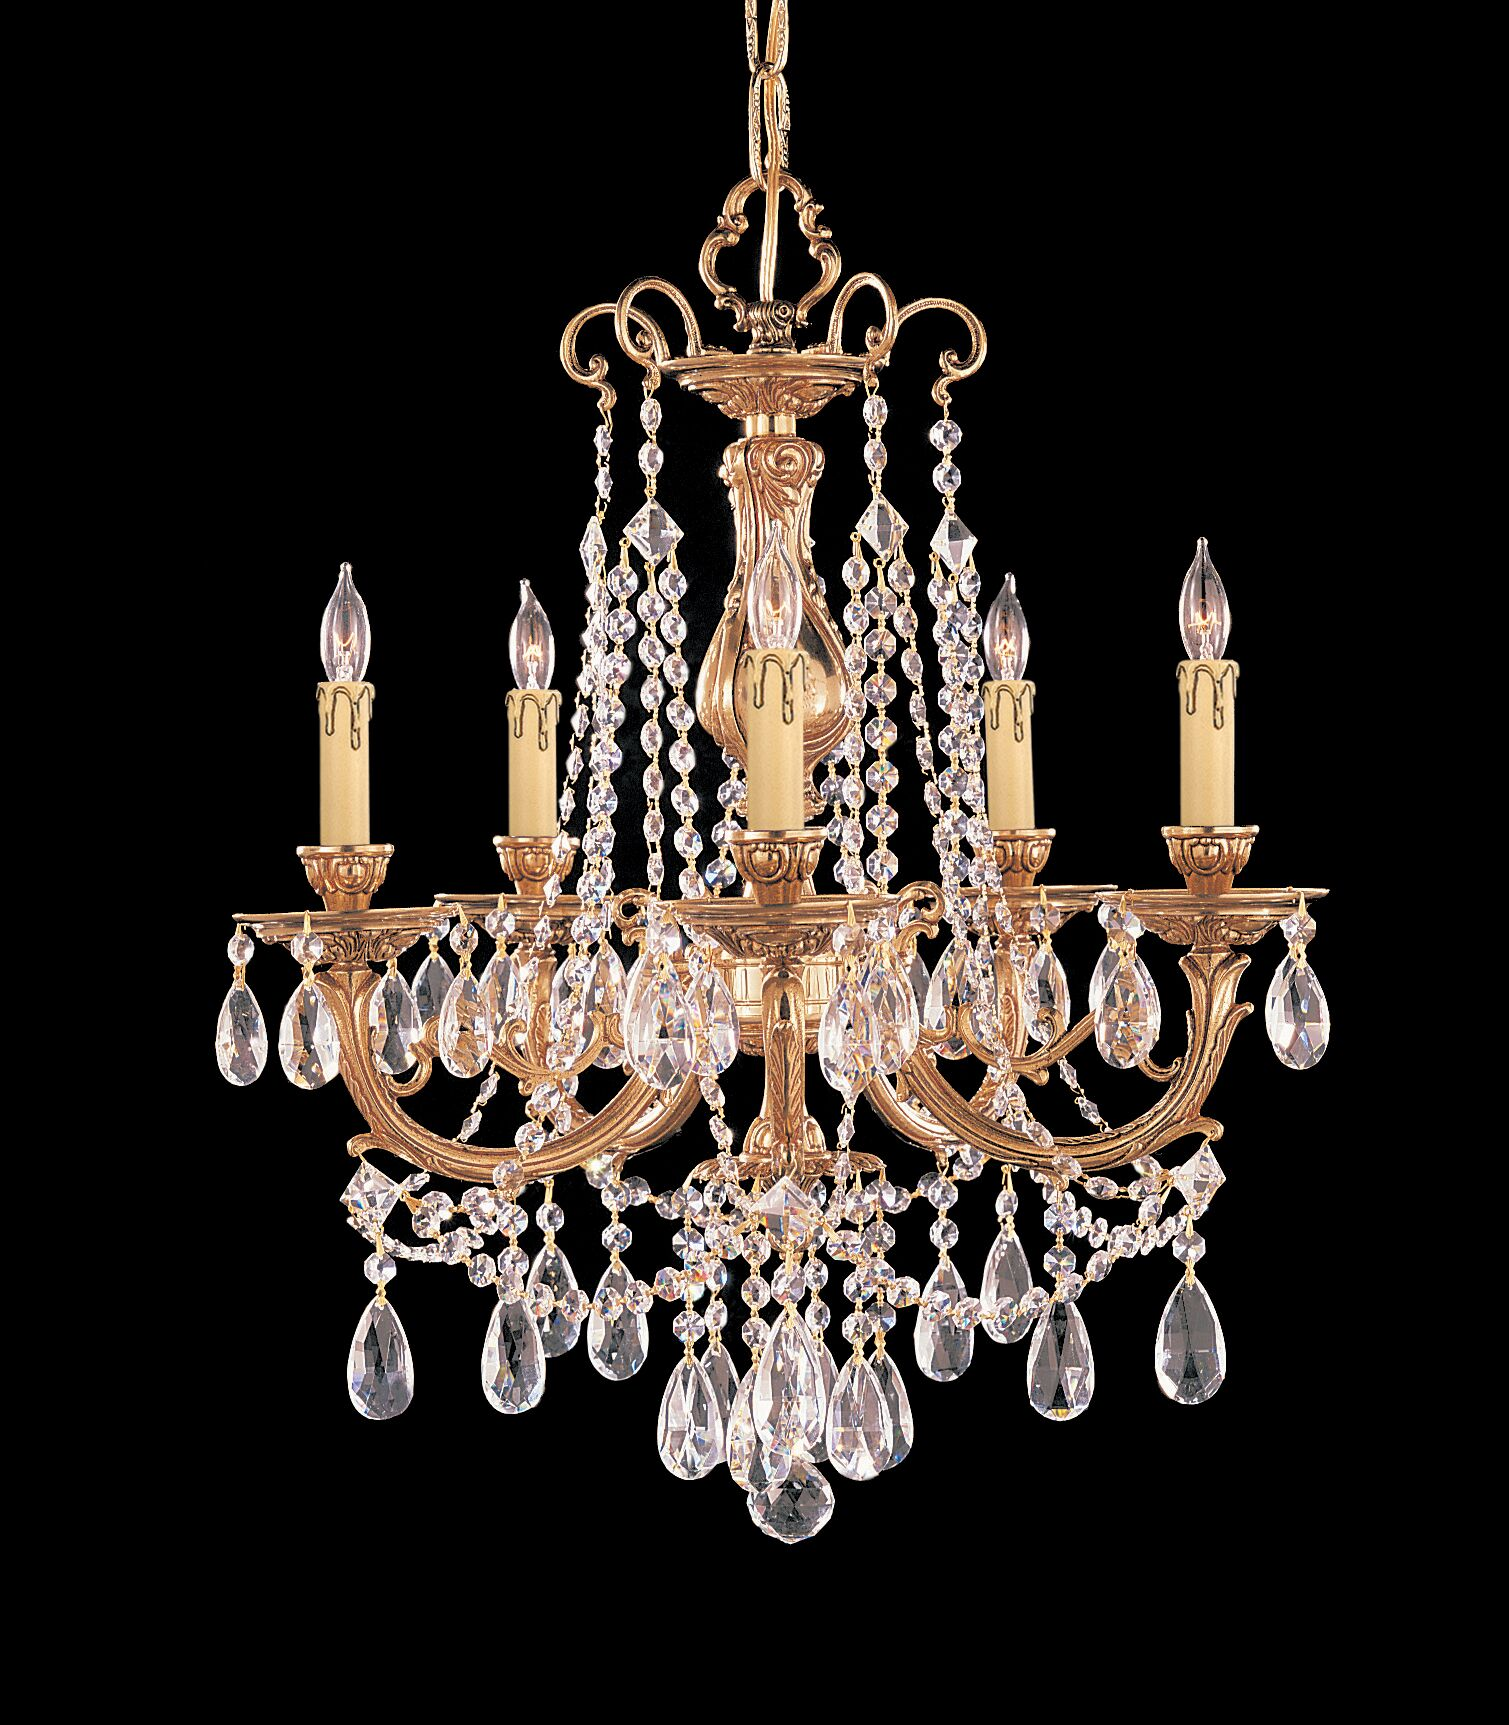 Aureolin 5-Light Crystal Chandelier Crystal: Swarovski Strass